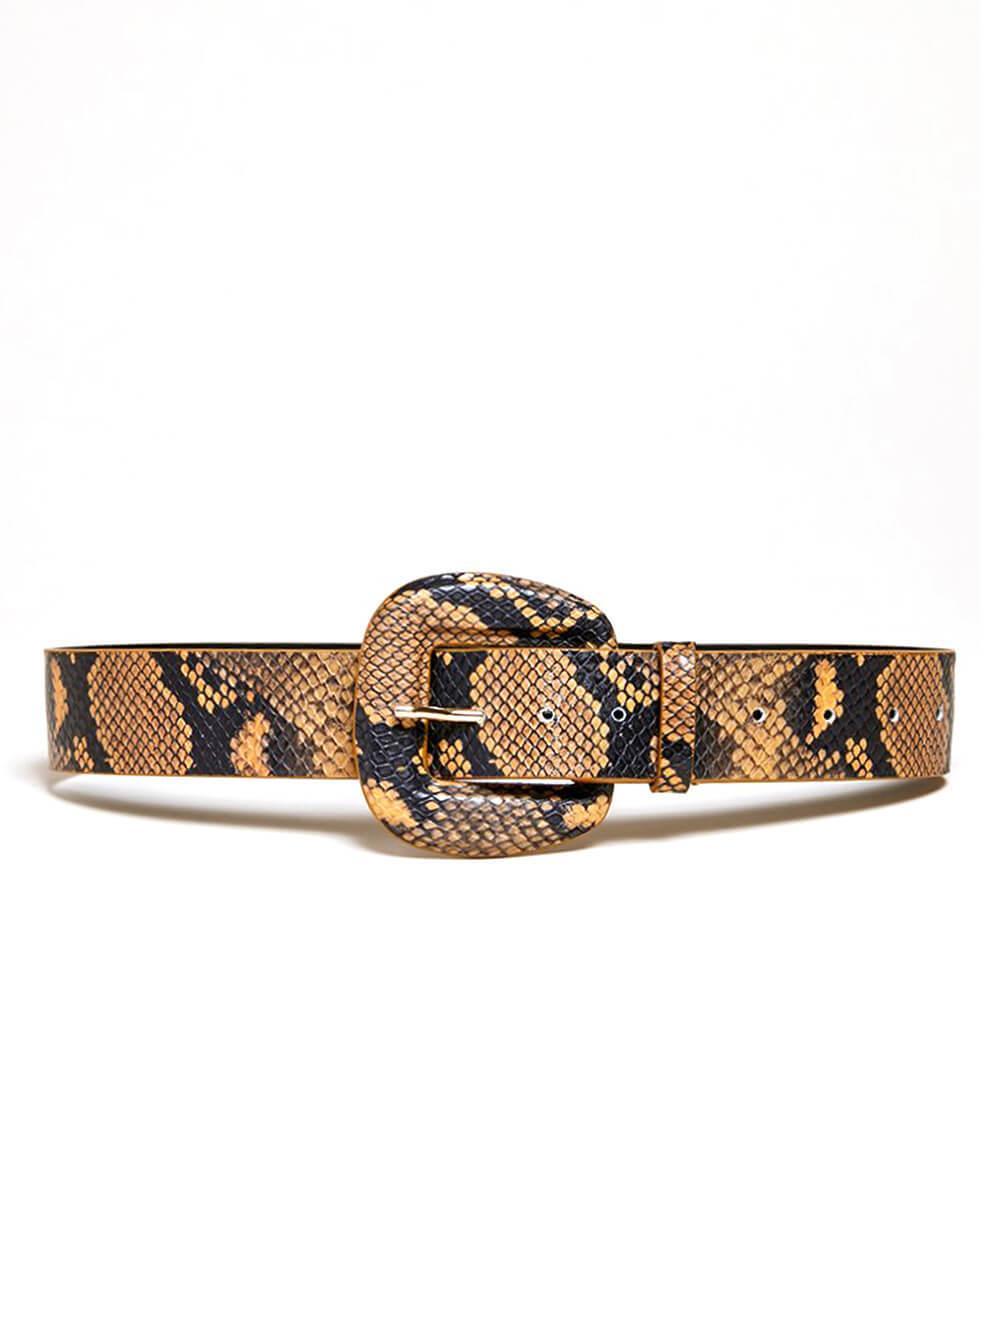 Emsy Belt